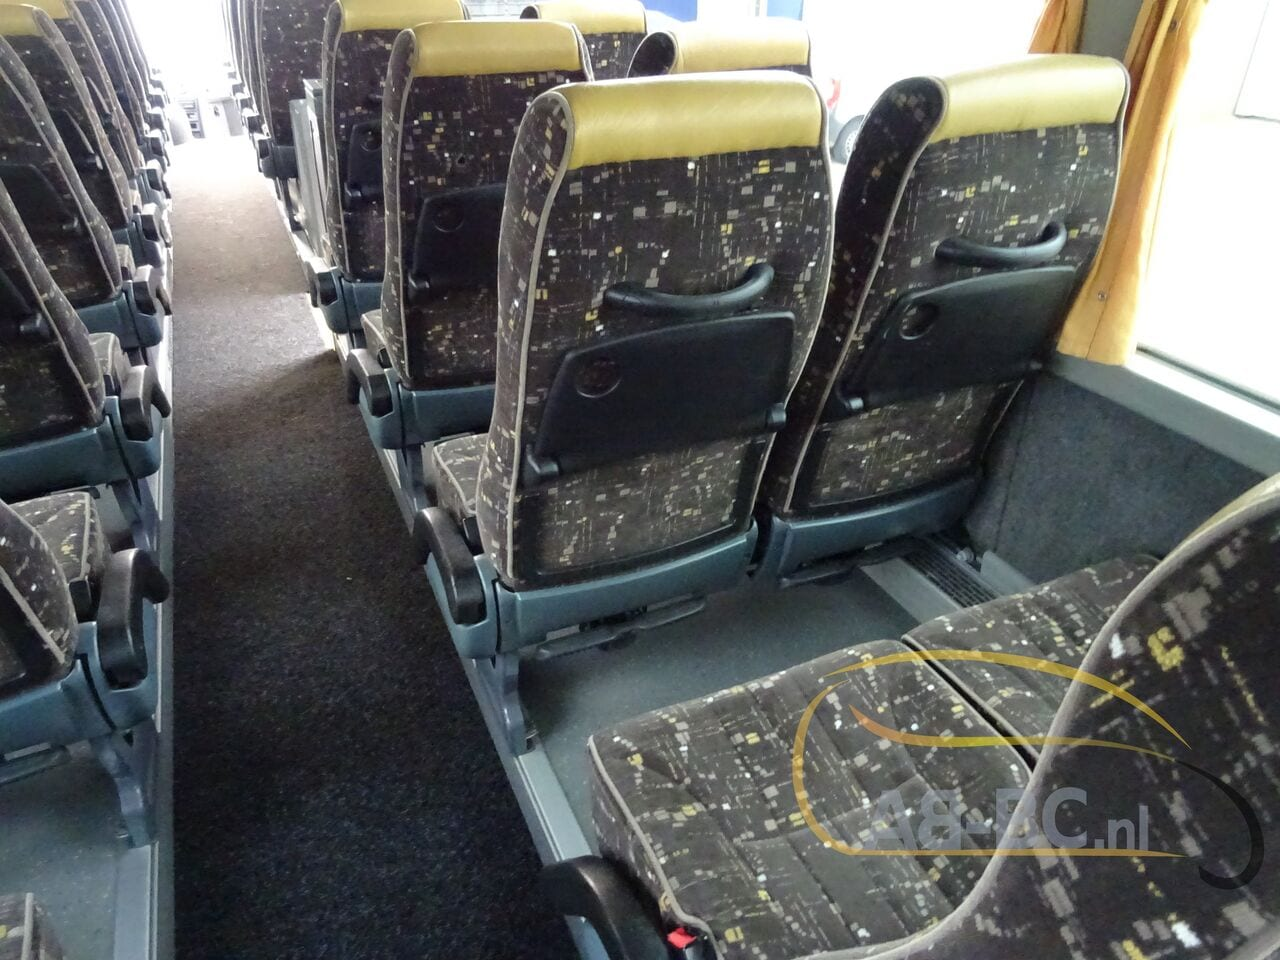 coach-busTEMSA-Safari-HD-51-Seats-EURO5-12-MTR---1614266670544573667_big_b135fae5dcd7a220e364159012ca6b35--19052917224730818200